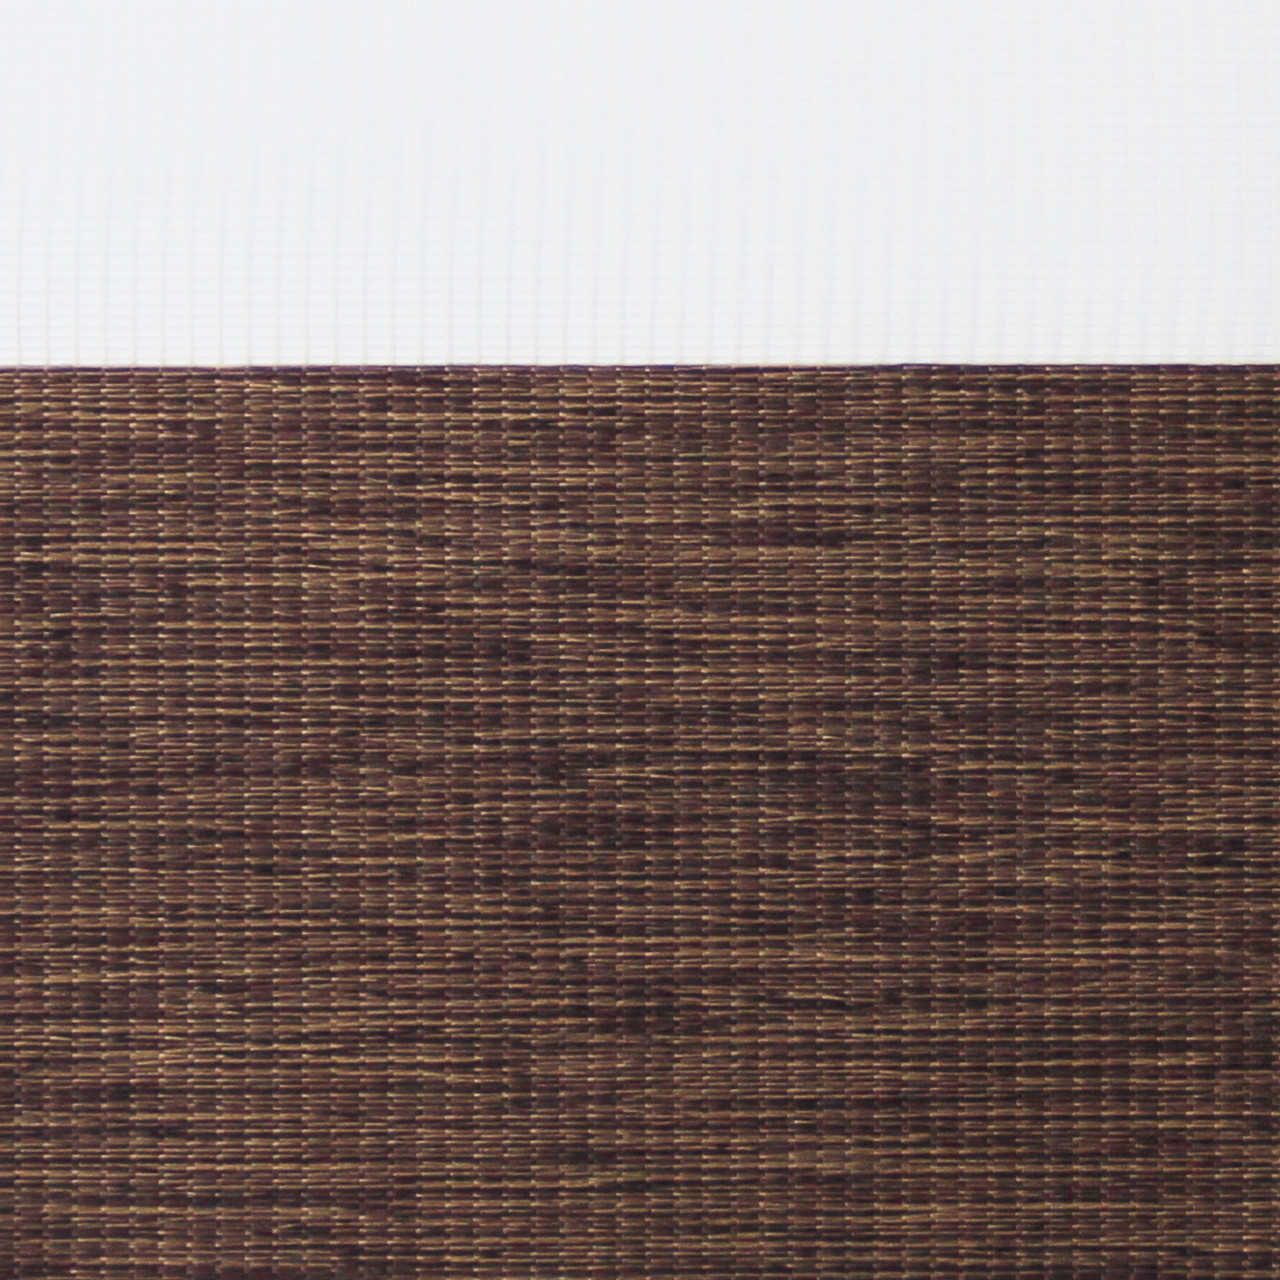 Рулонные шторы День-ночь Ткань Марго блэкаут Бронза